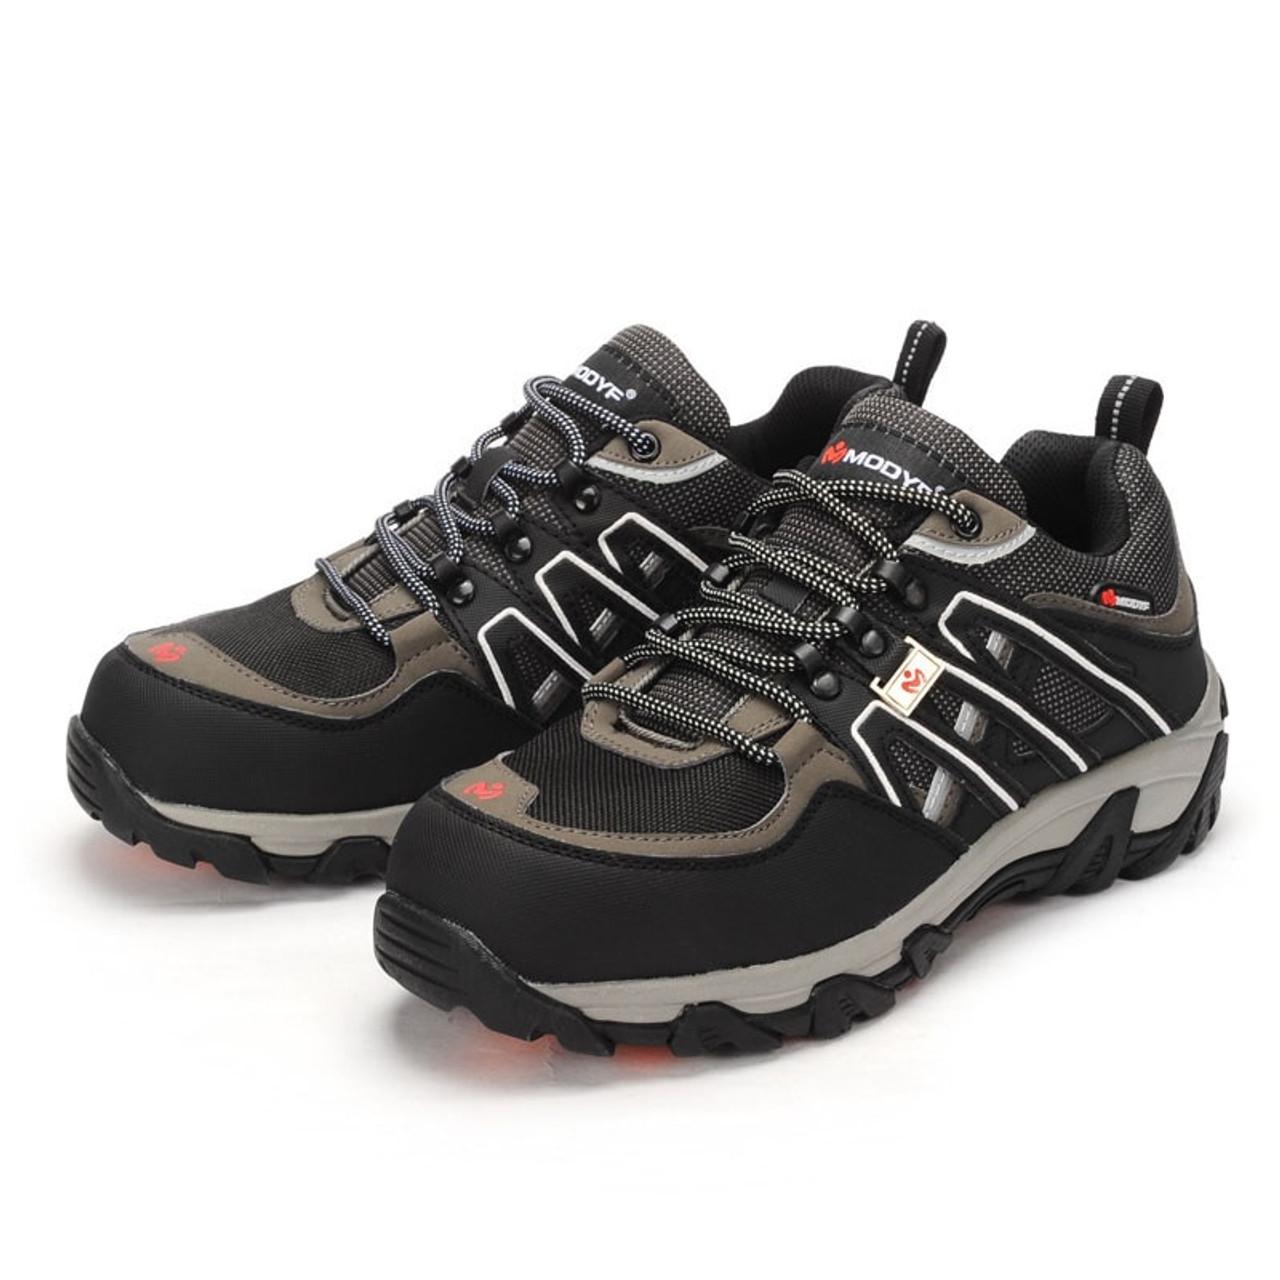 Men Steel Toe Safety Work Shoes Hiking Sneaker Multifunction Steel Protection Footwear Puncture Proof Construction Safety Boots Work & Safety Boots